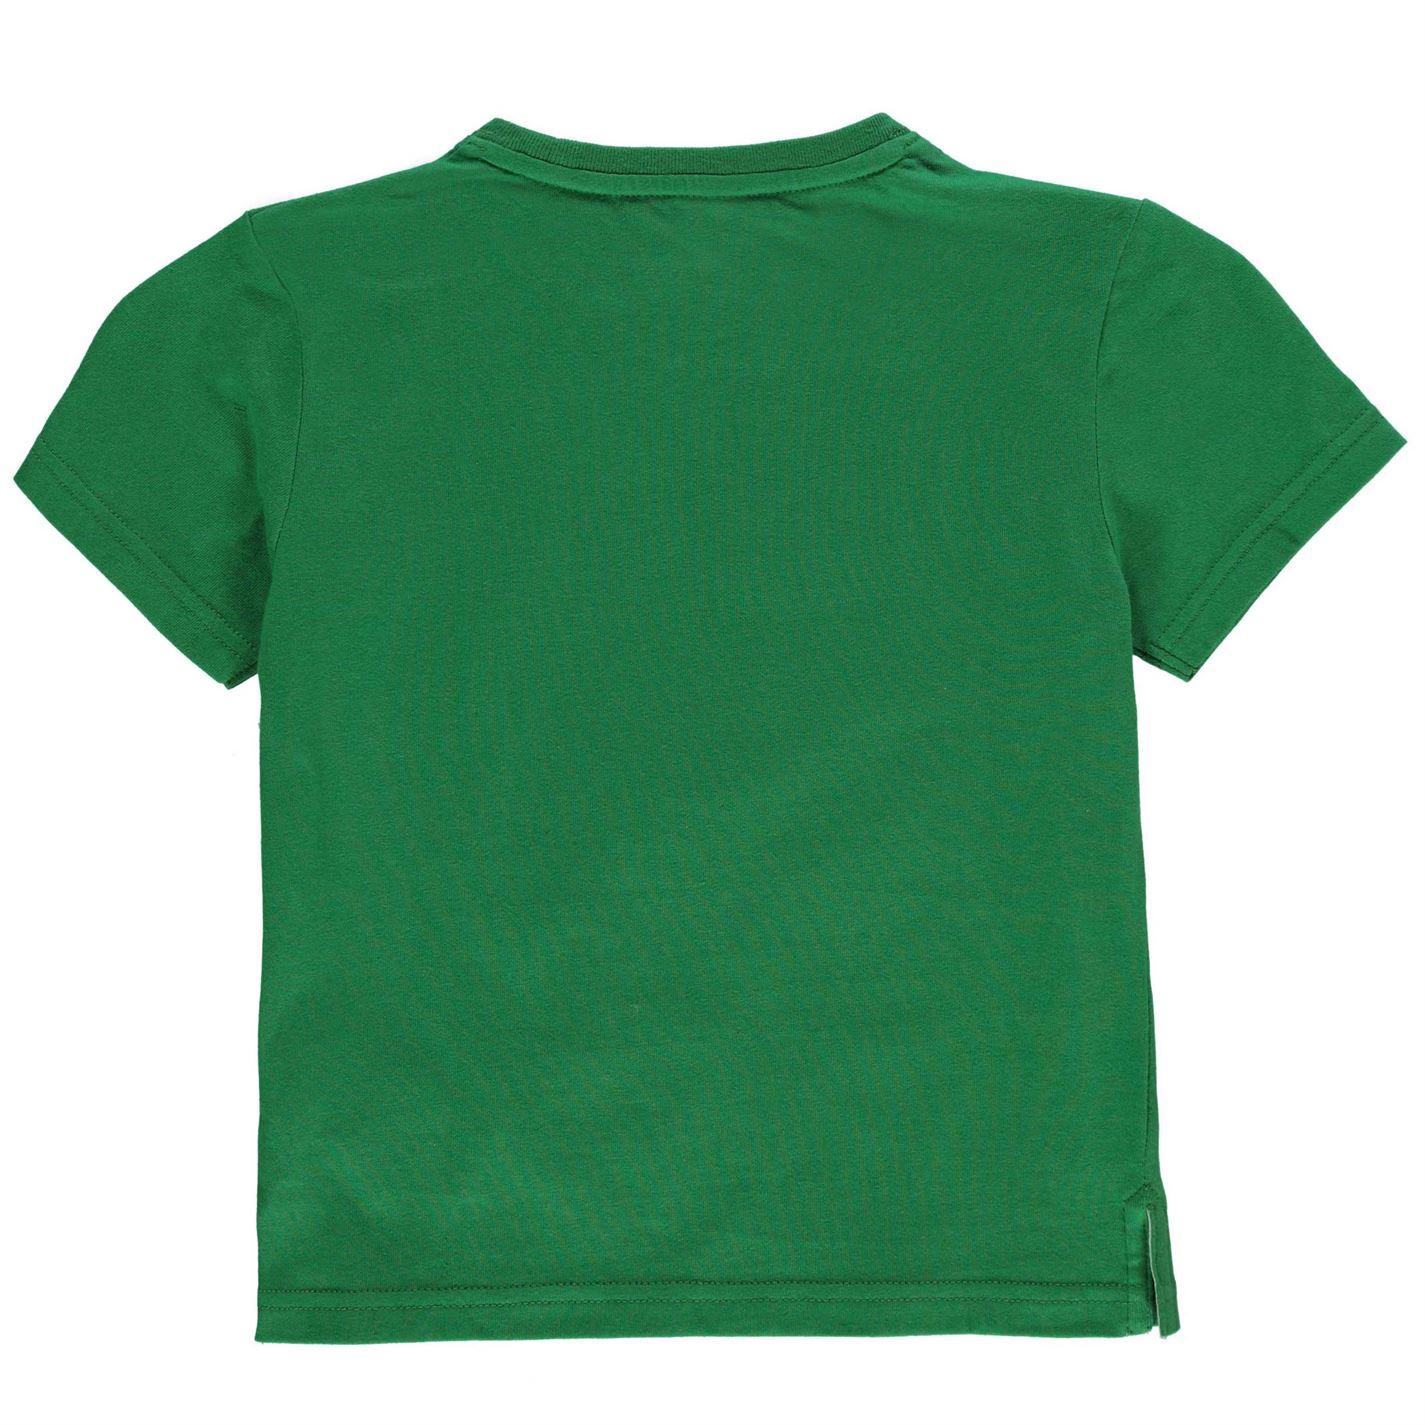 Team Newcastle United Crest T Shirt Infants Boys Crew Neck Tee Top Short Sleeve